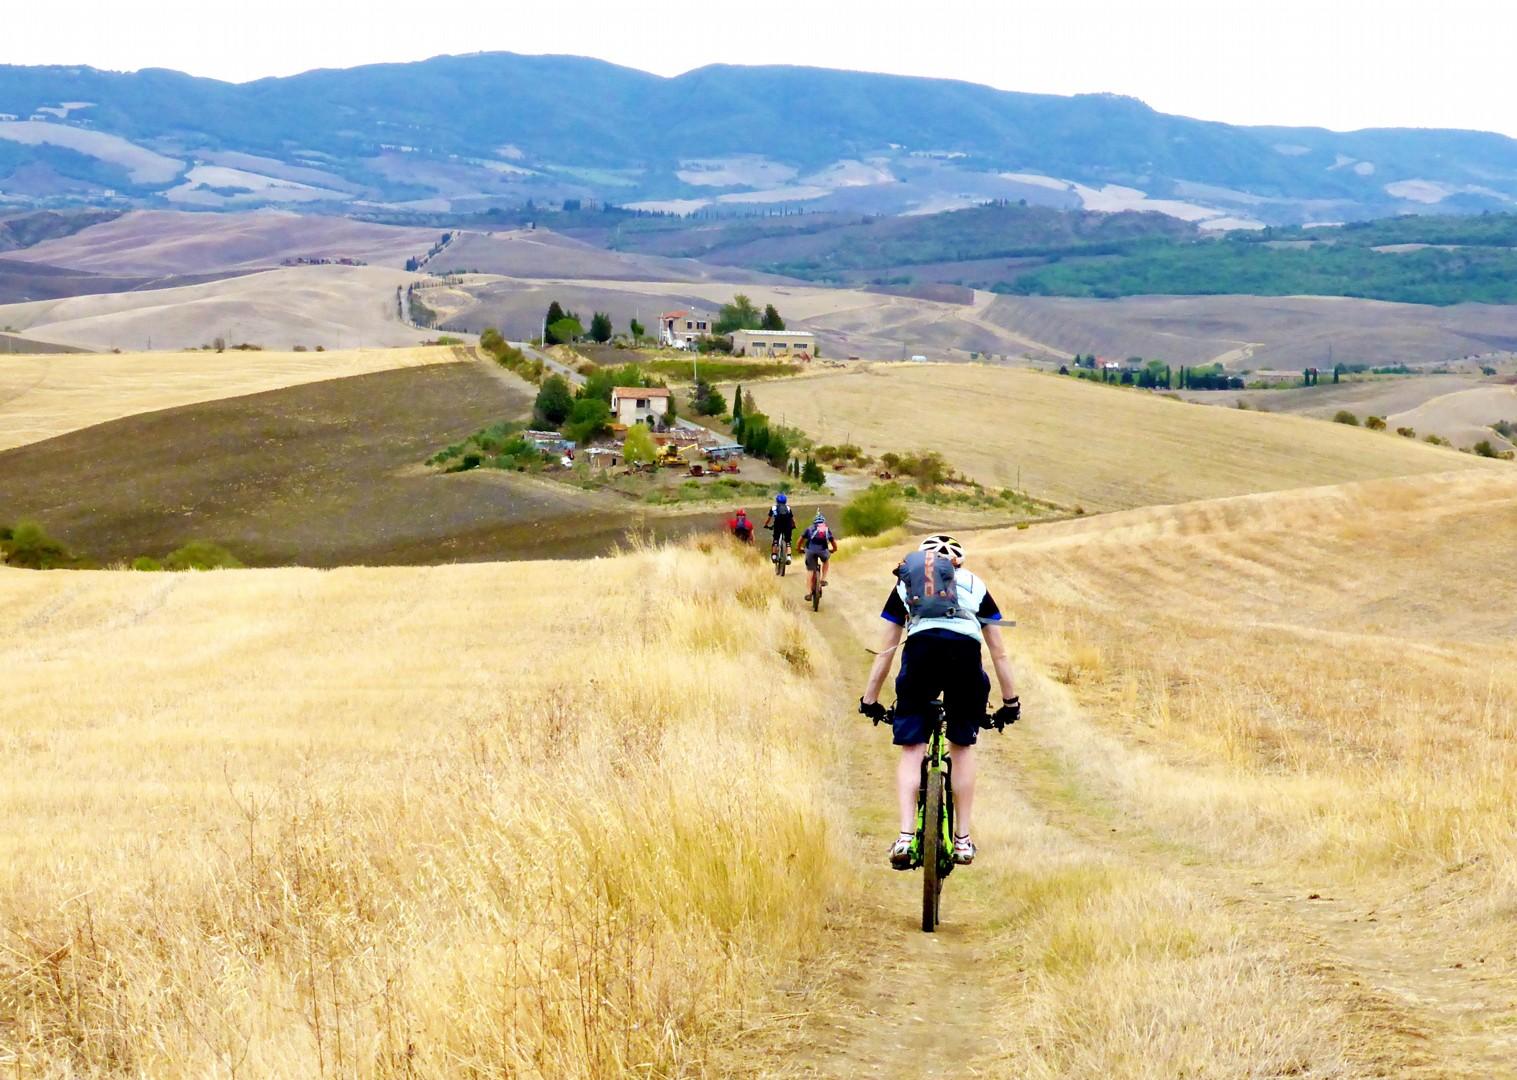 Foto 11-09-17, 12 55 10.jpg - Italy - Via Francigena (Tuscany to Rome) - Guided Mountain Biking Holiday - Mountain Biking